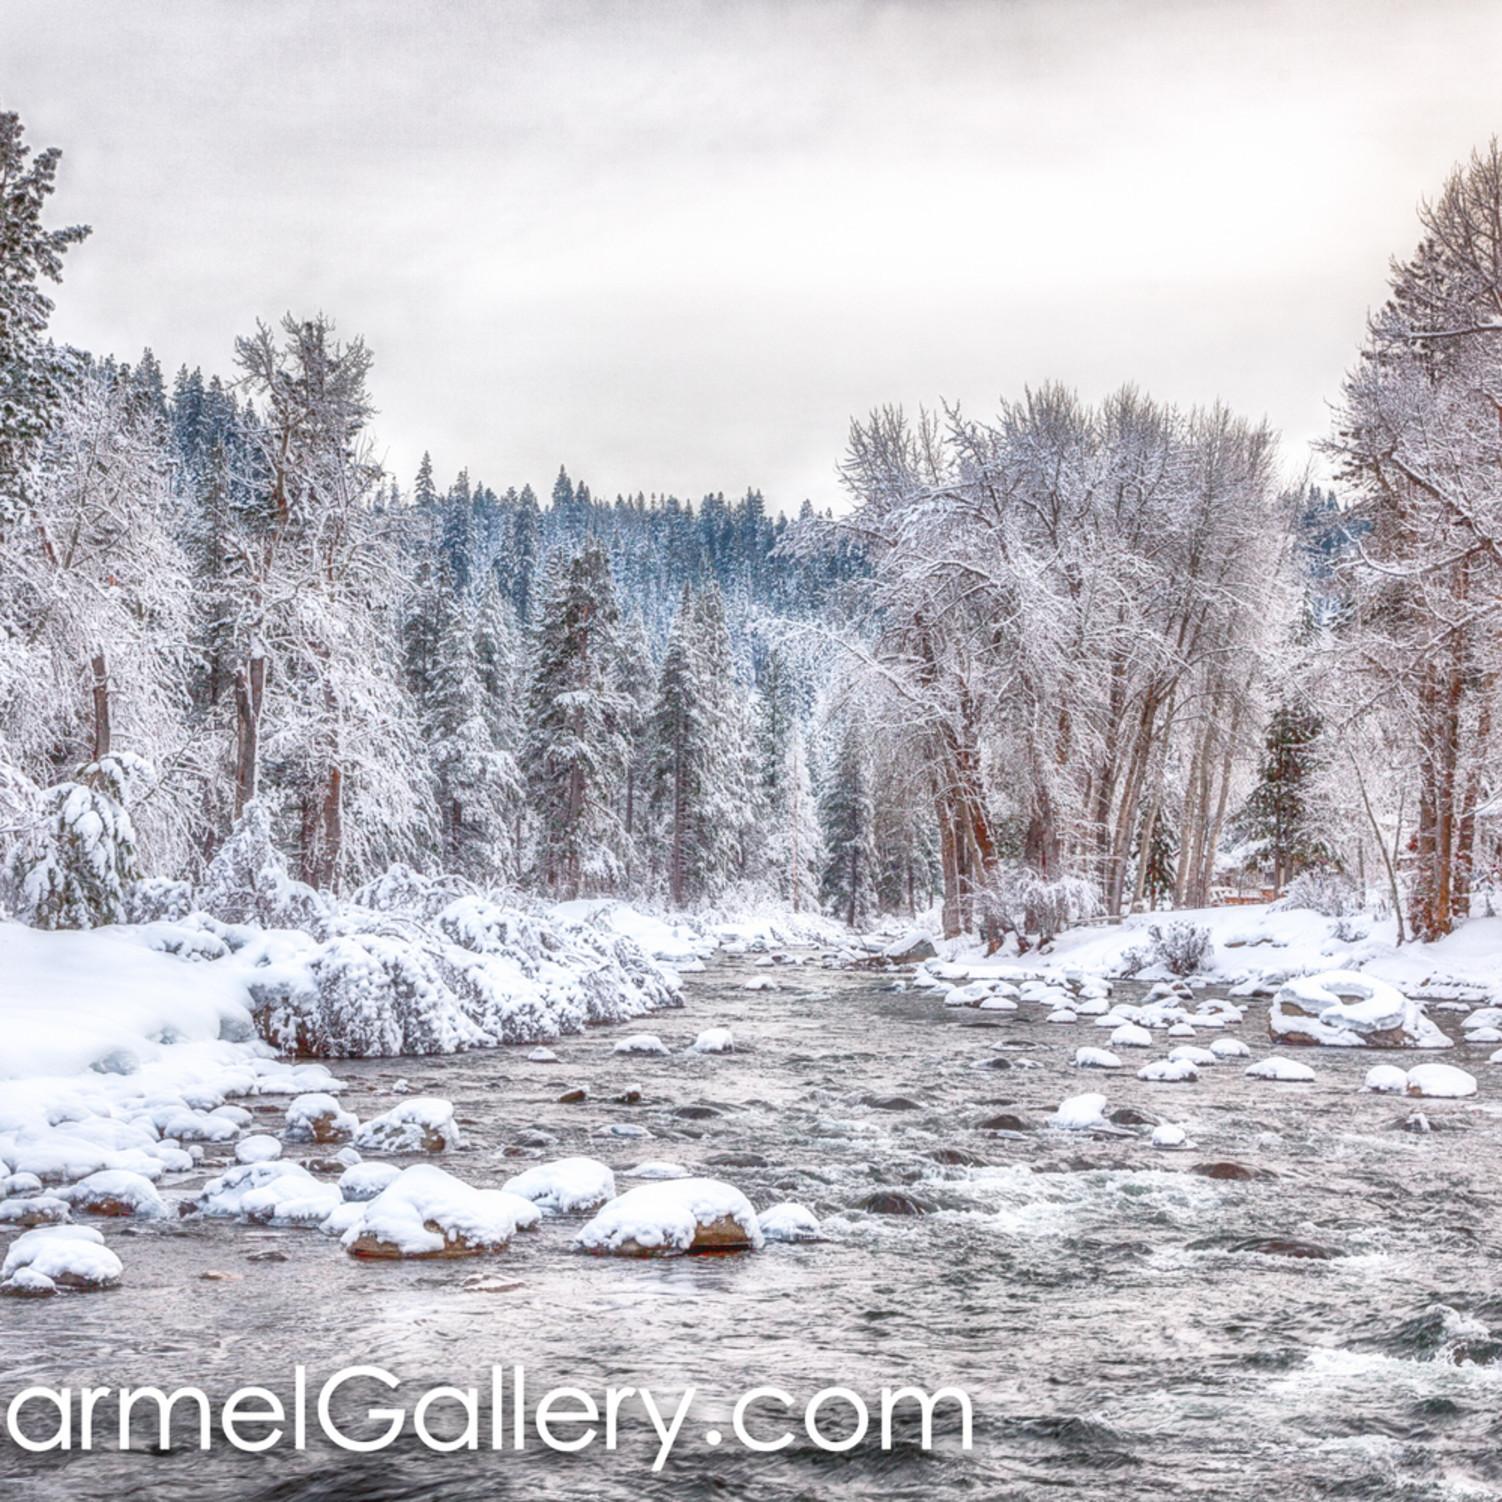 Truckee river in winter hagdoh